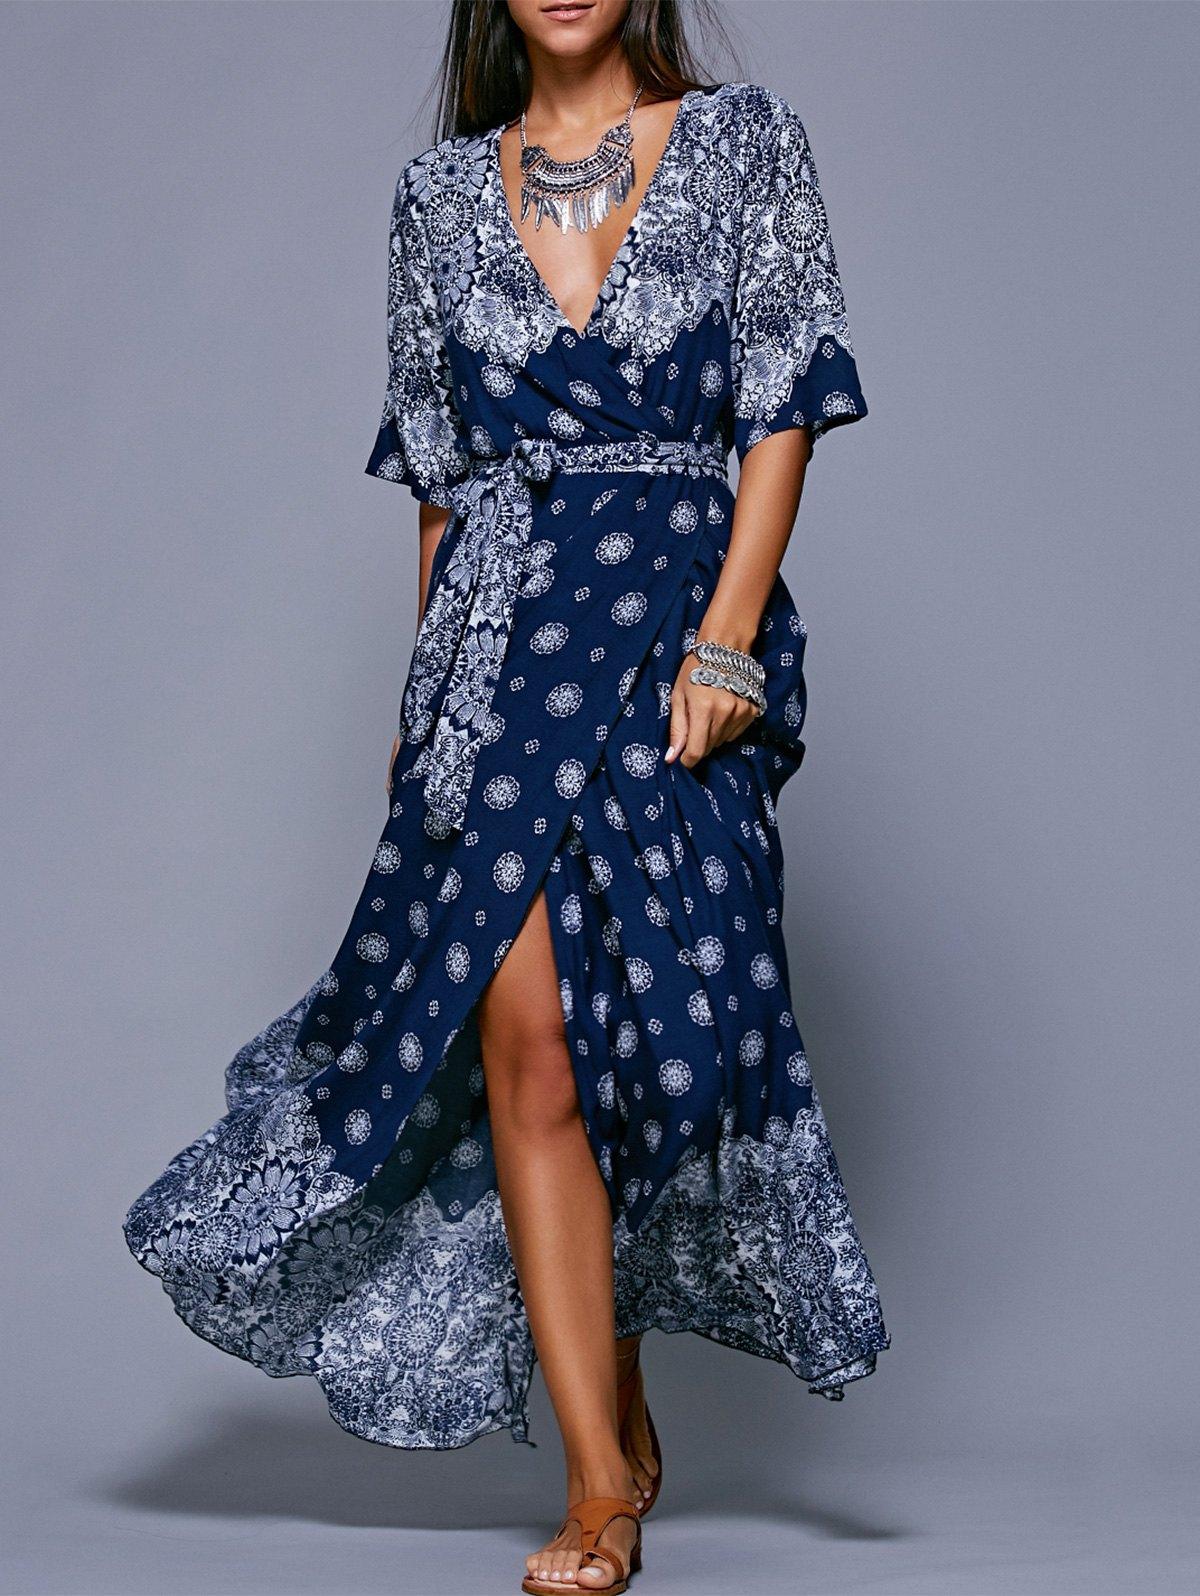 dresses for women bohemian slit print long flowing wrap dress PJJKKVS